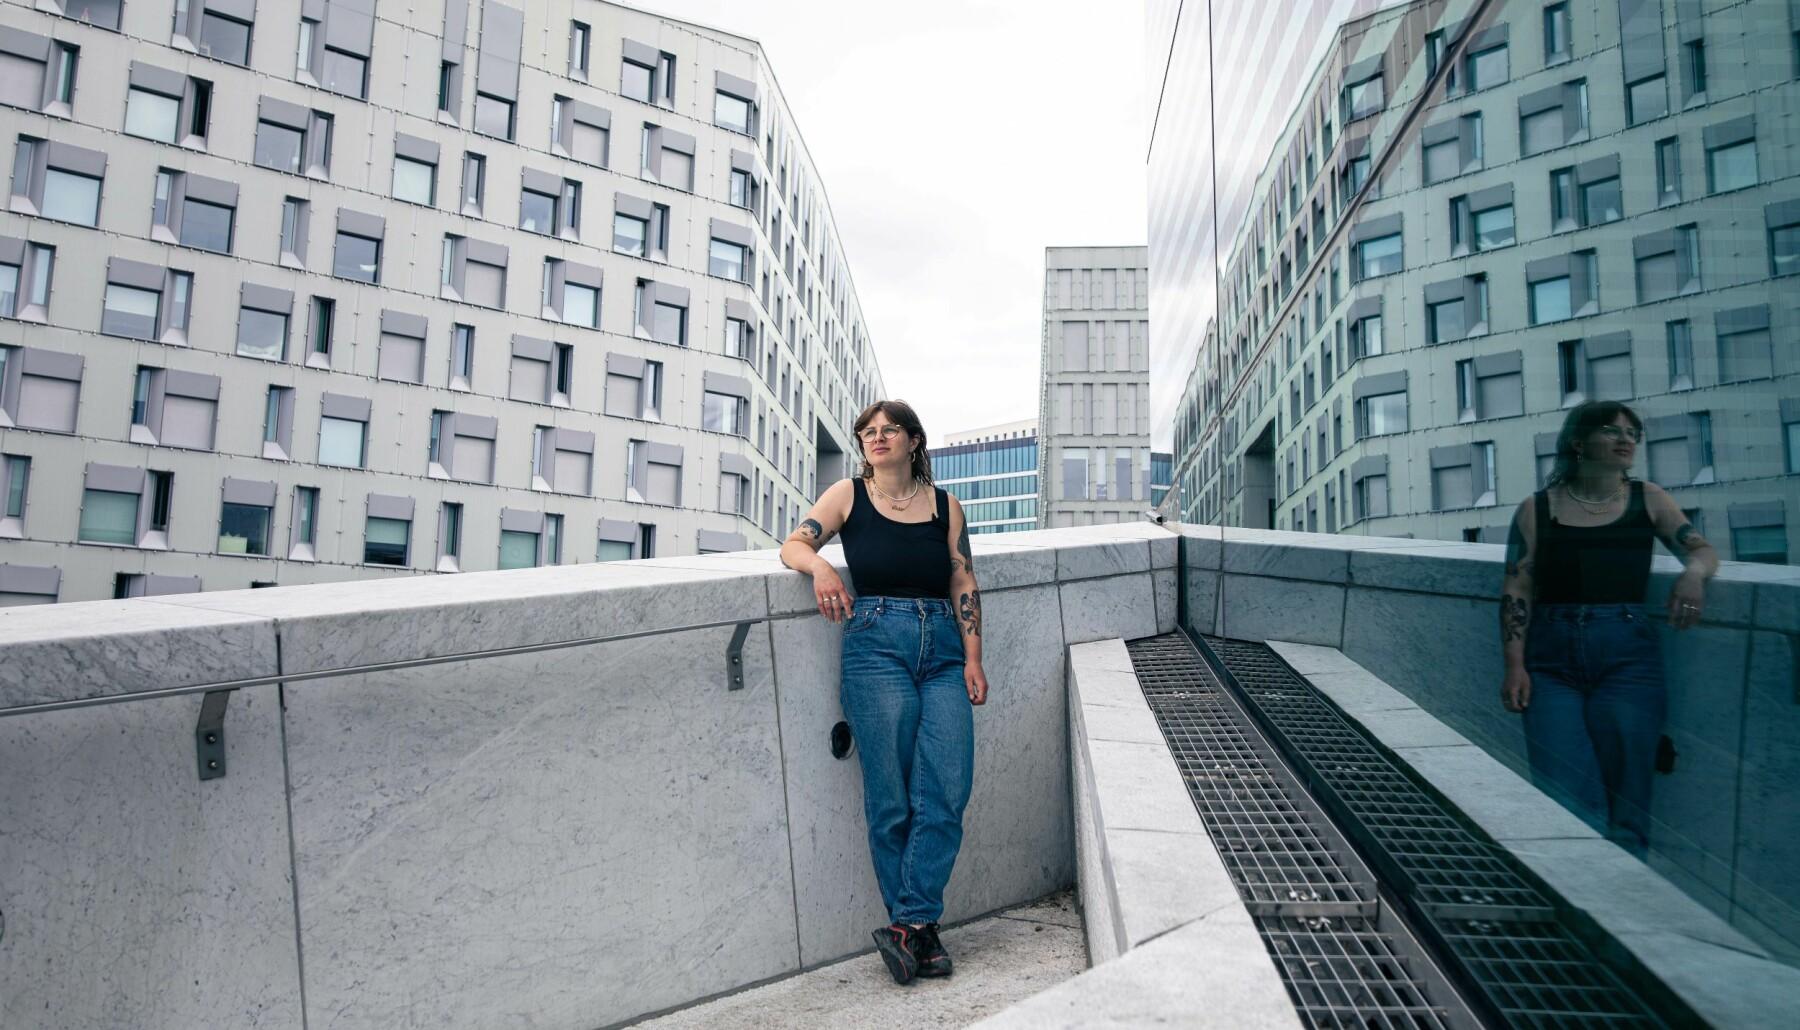 Oslo 11.06.2021 – Sigrid Elise Høeg bak